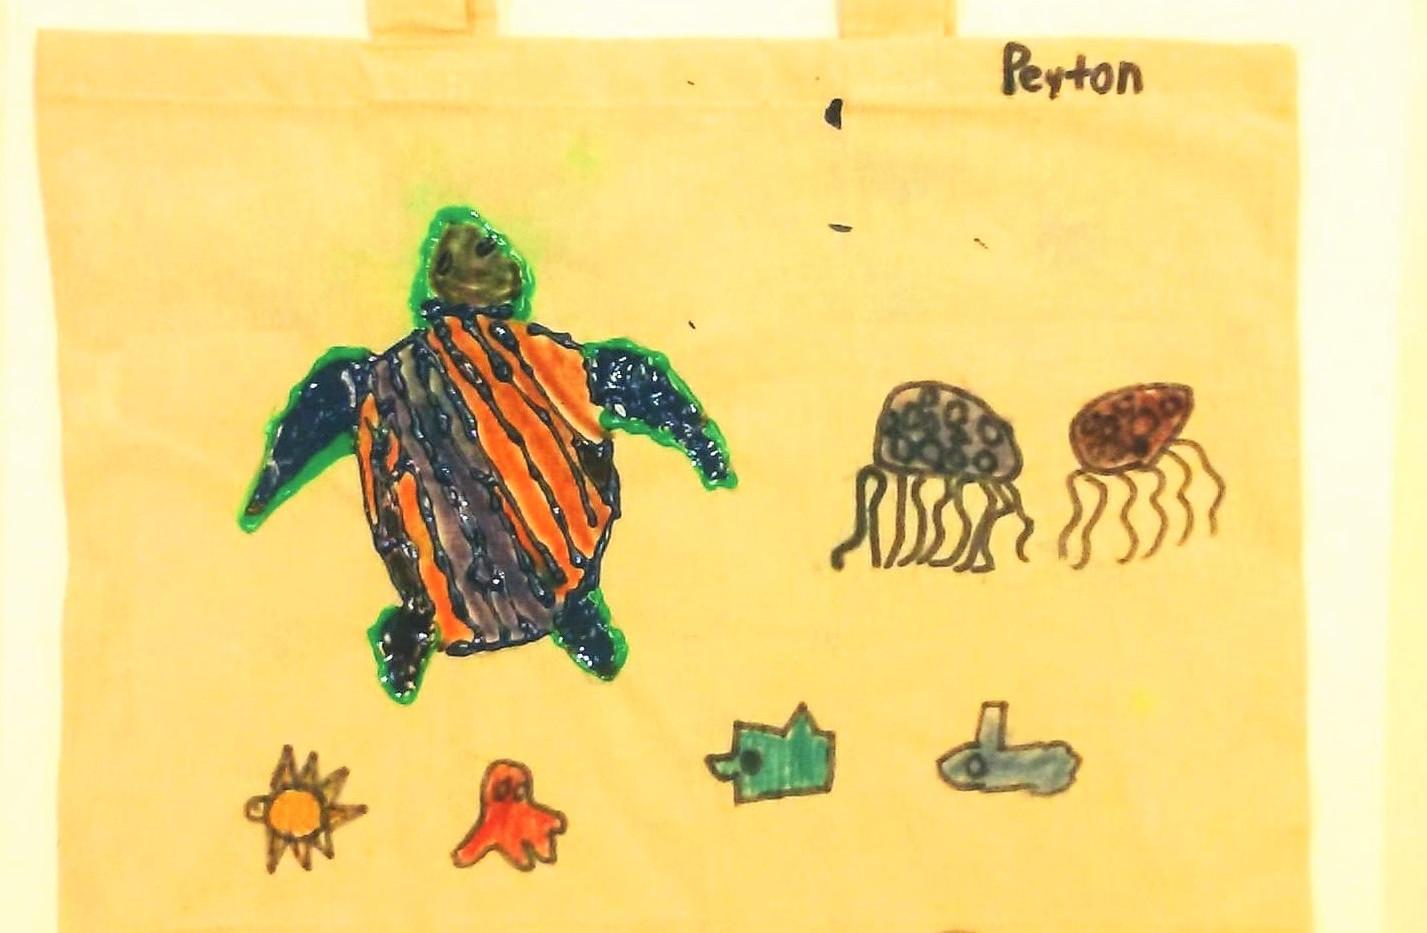 Peyton_s Sea Turtle tote.jpg